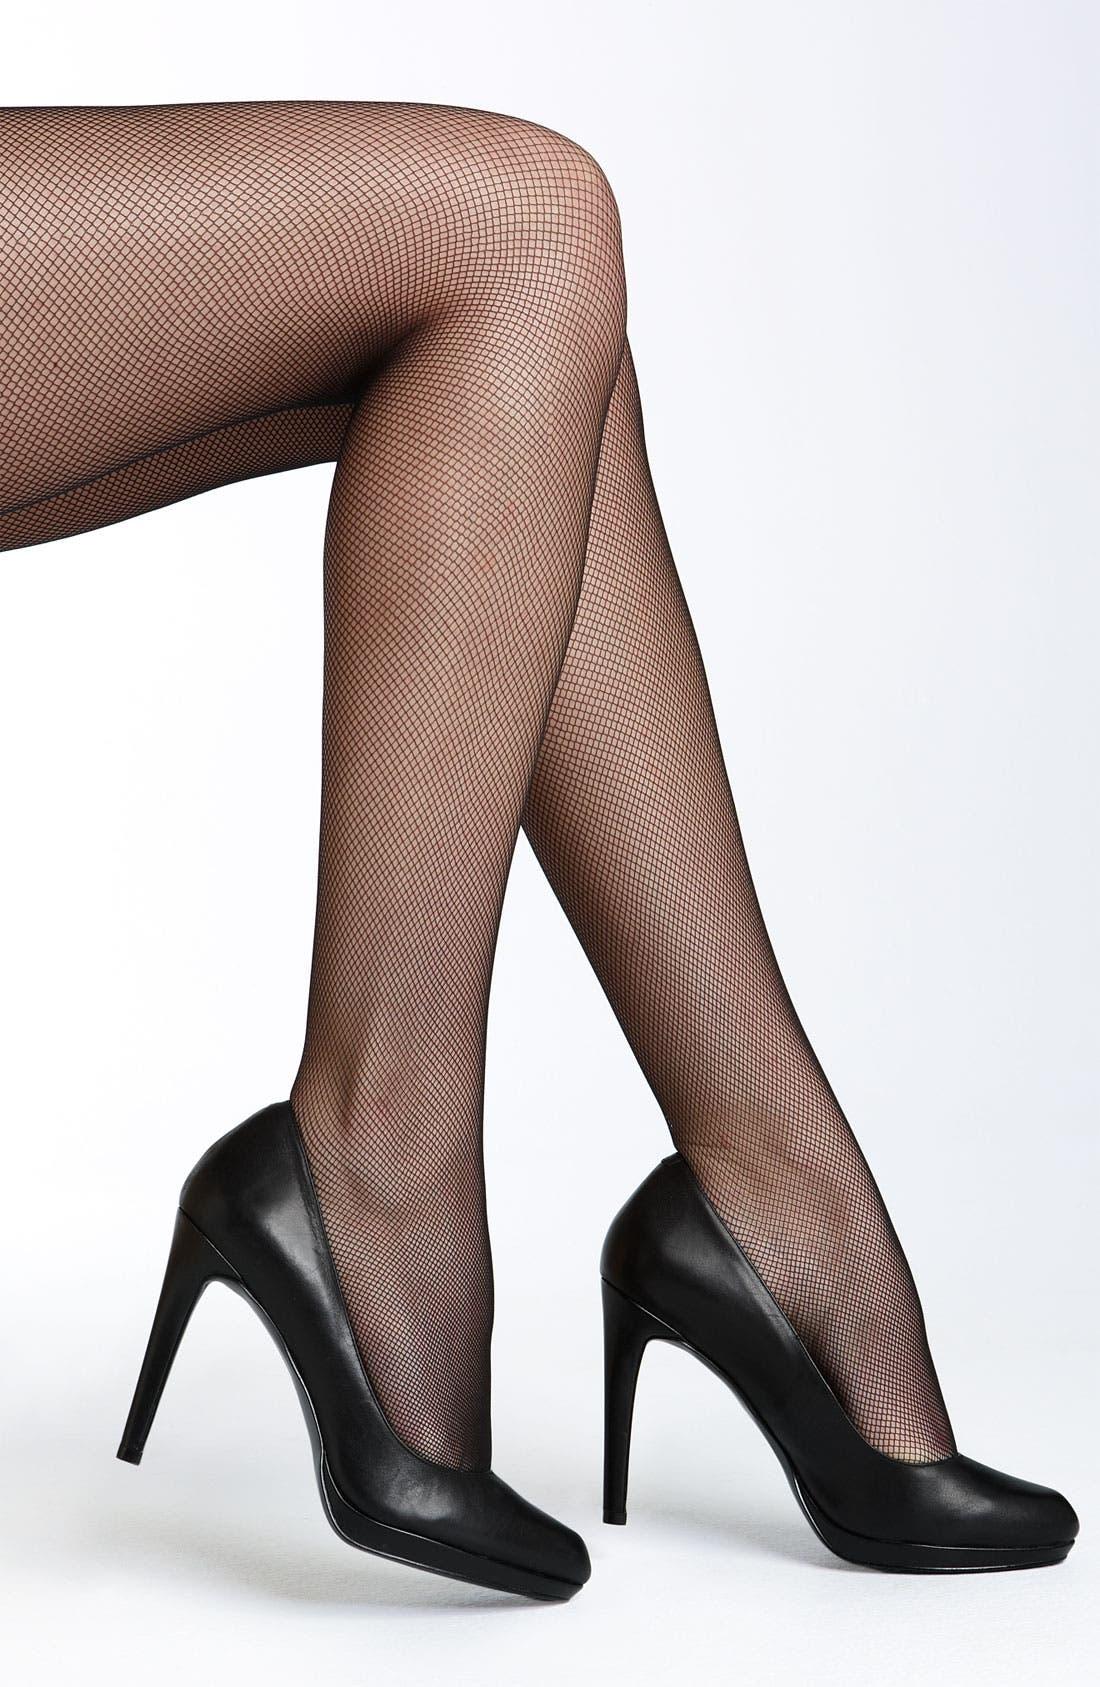 Alternate Image 1 Selected - Donna Karan 'Micro Tulle' Tights